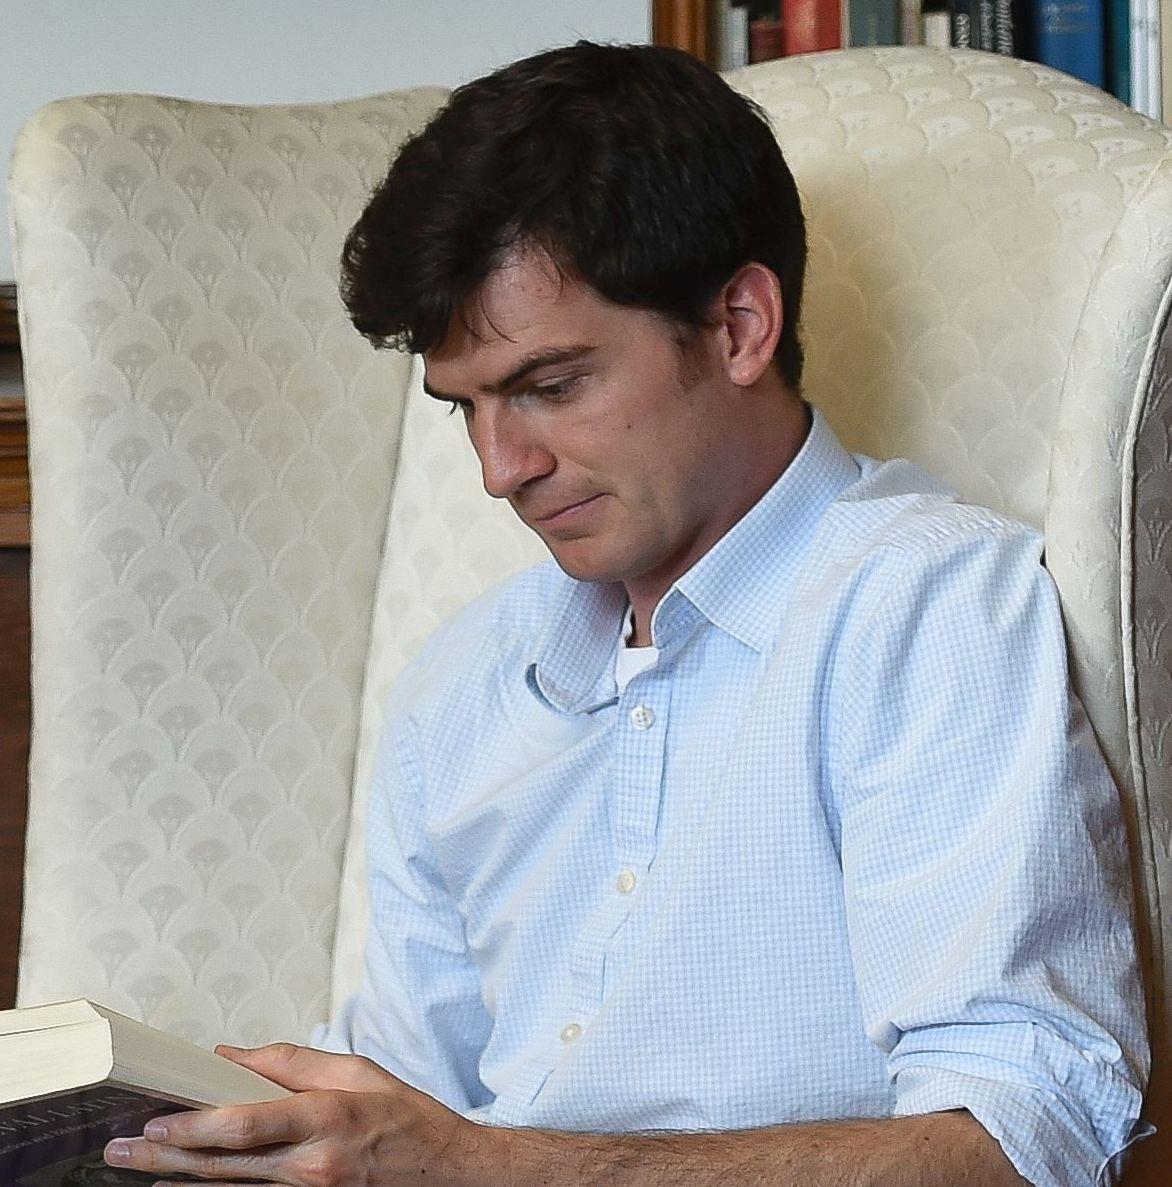 Doctoral Candidate Jon Paul Heyne reading a book